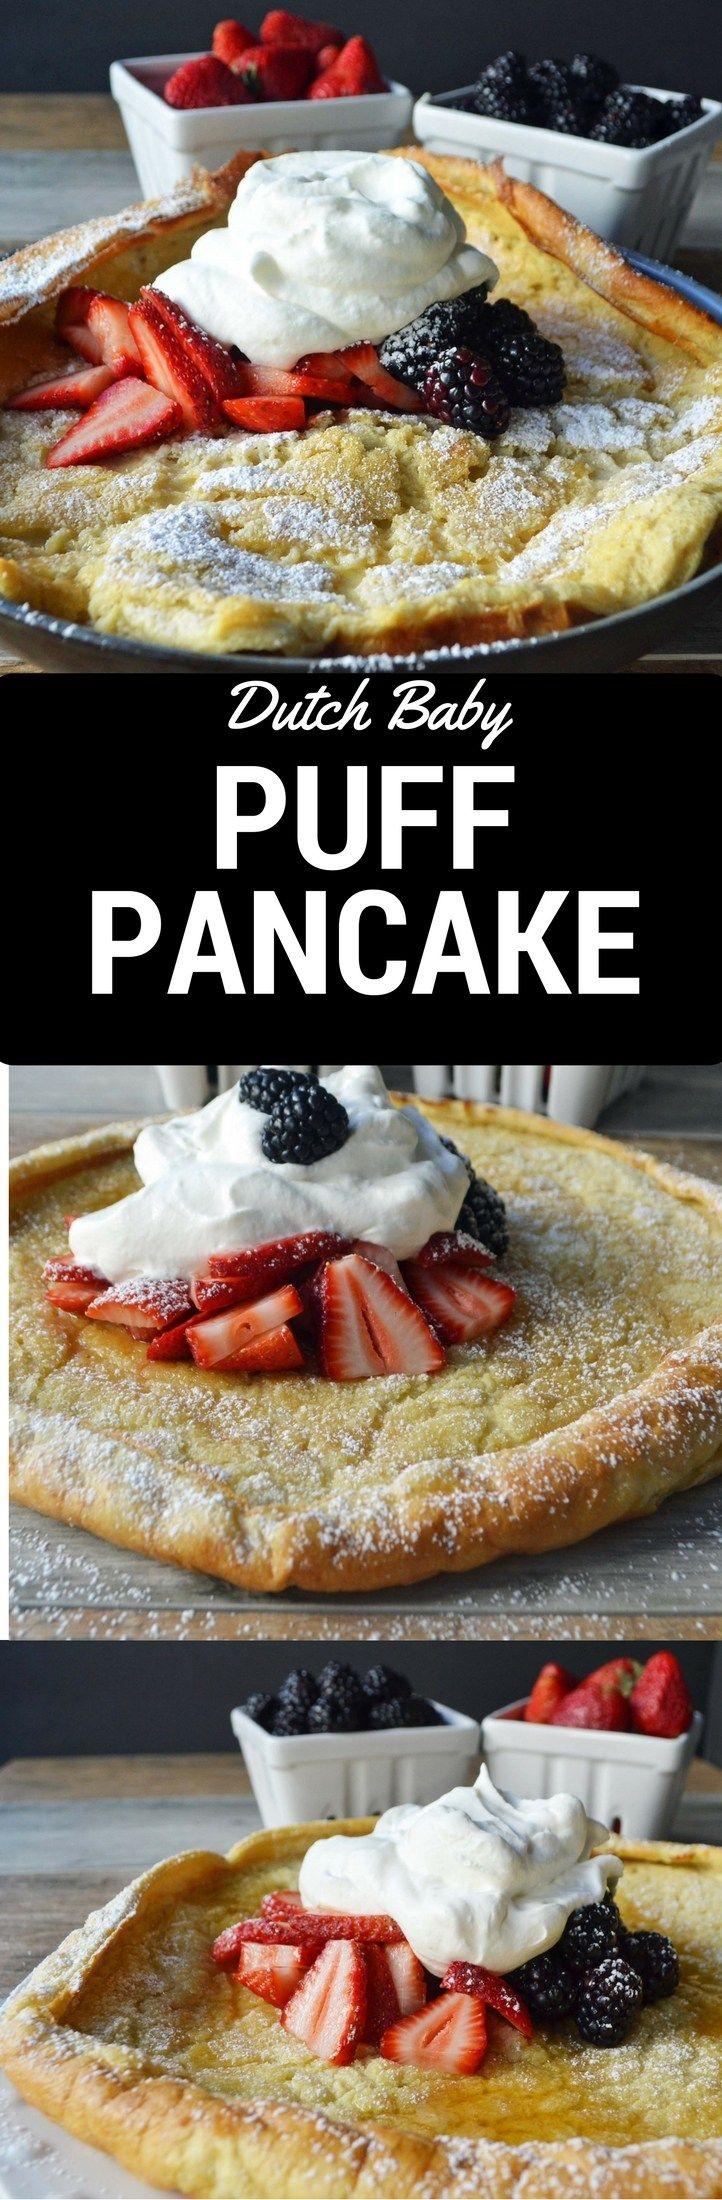 Dutch Baby Puff Pancake by Modern Honey